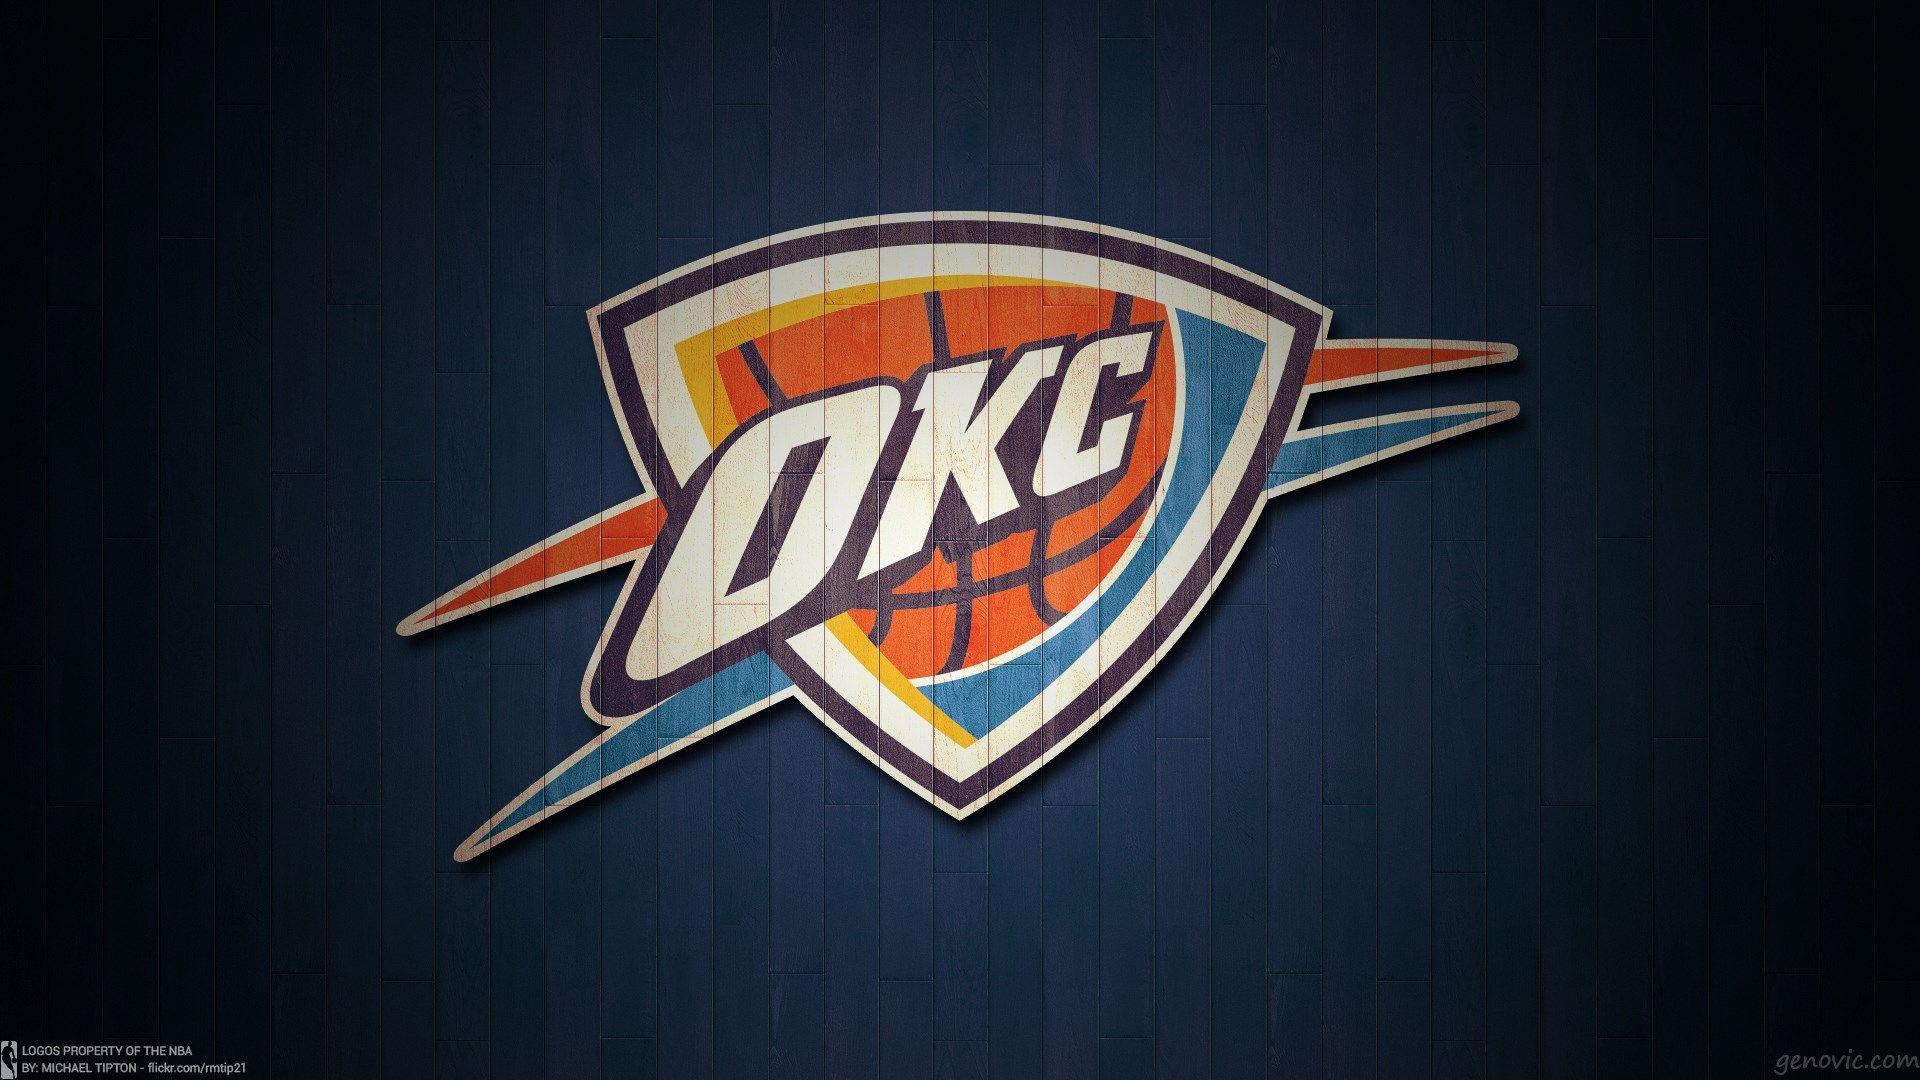 Okc Thunder Wallpaper Best Cool Wallpaper HD Download Okc 1920x1080